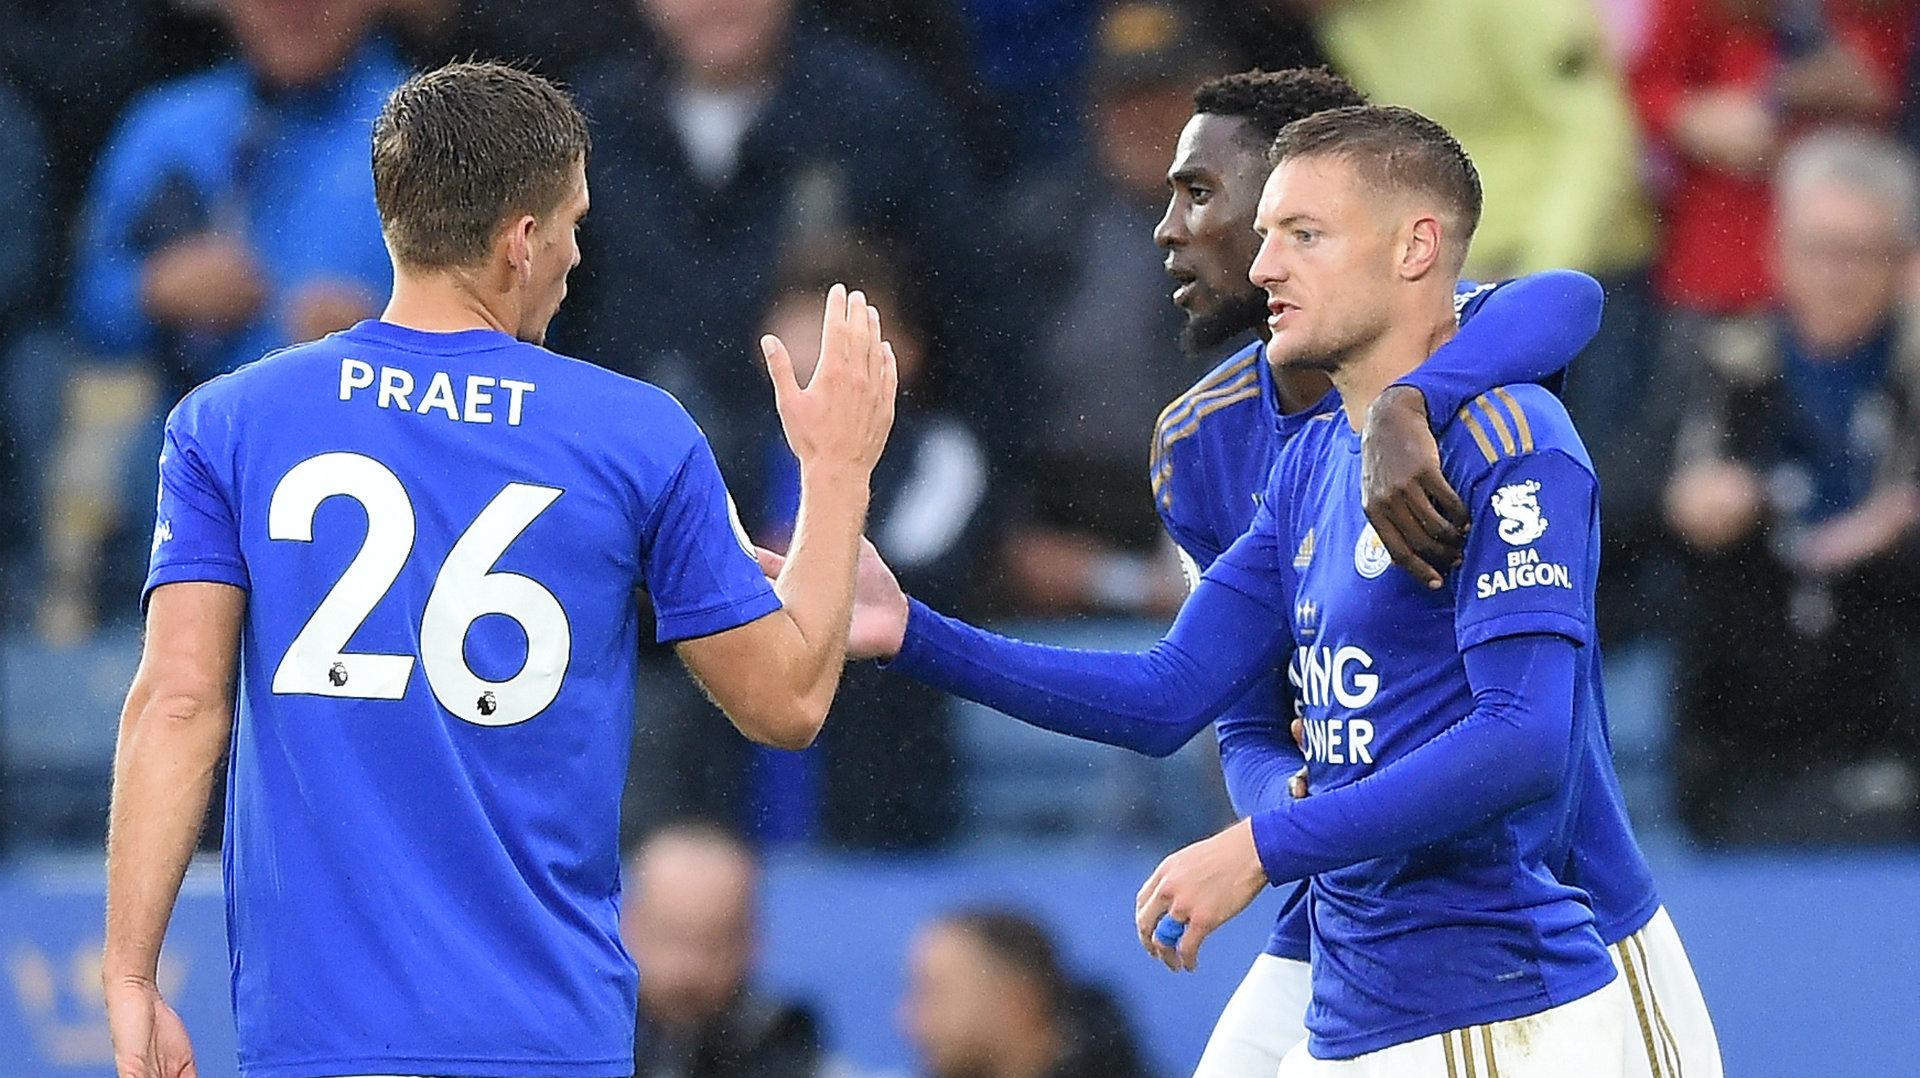 Jamie Vardy Dennis Praet Leicester vs Newcastle 2019-20